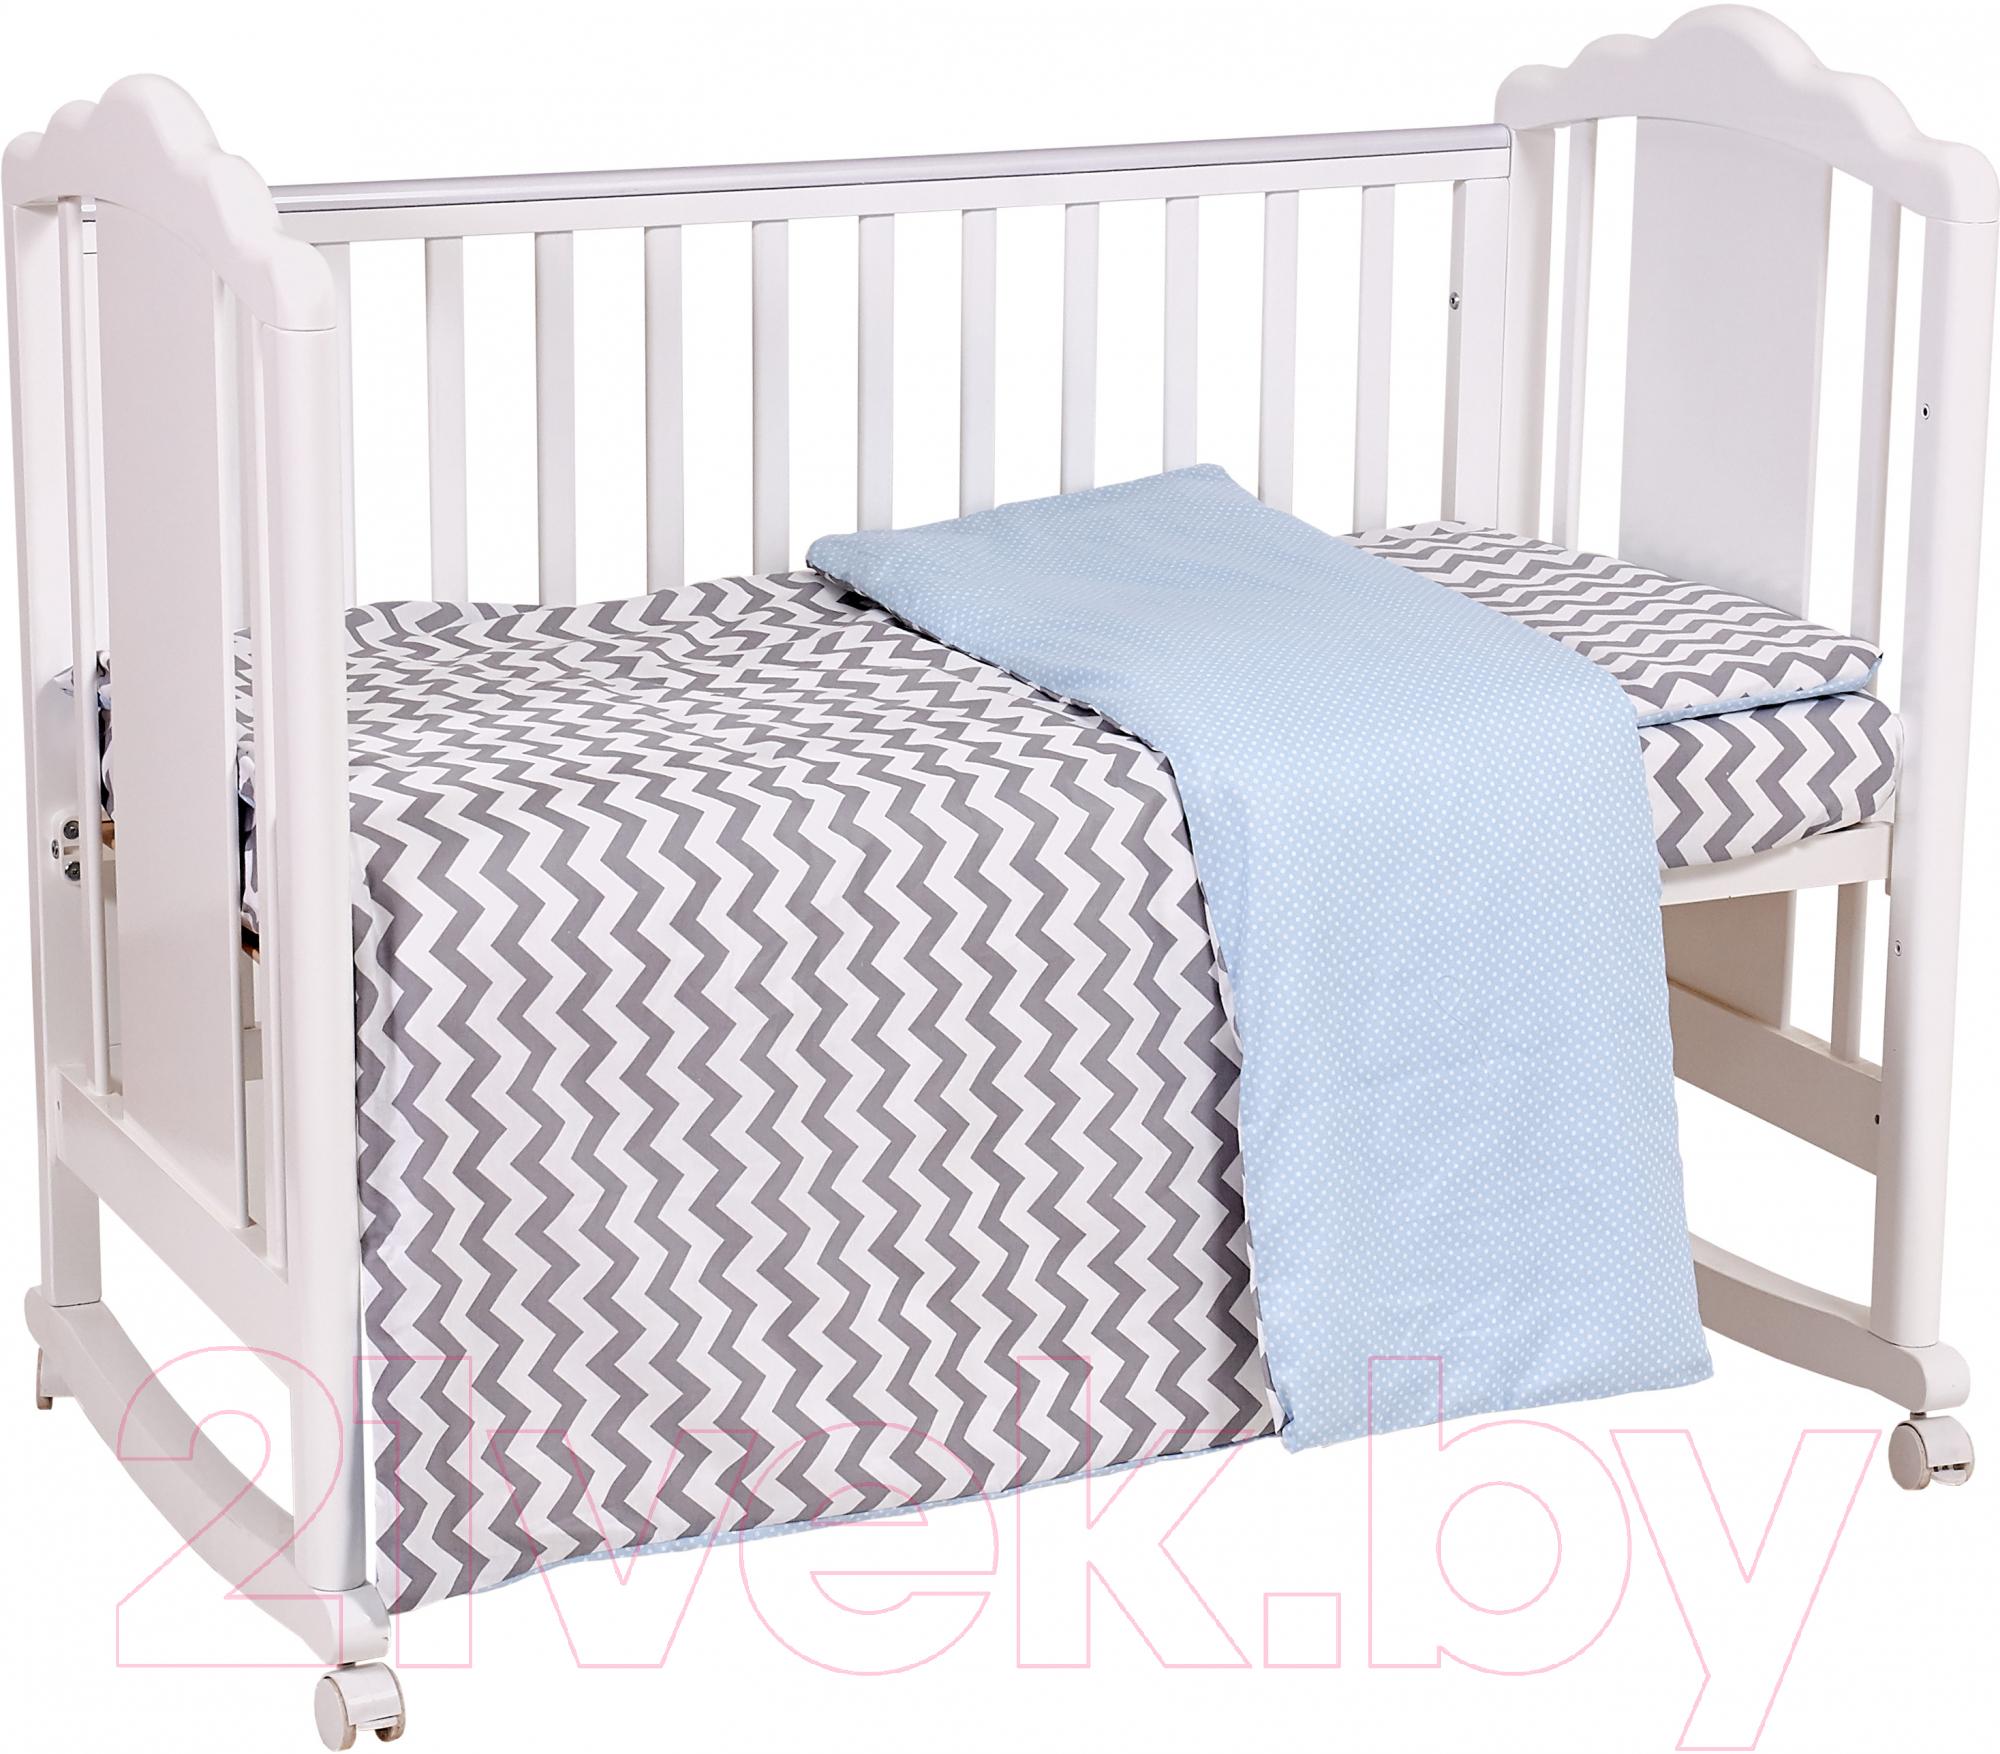 Купить Комплект в кроватку Polini Kids, Зигзаг (серый/голубой), Россия, хлопок, Зигзаг (Polini Kids)